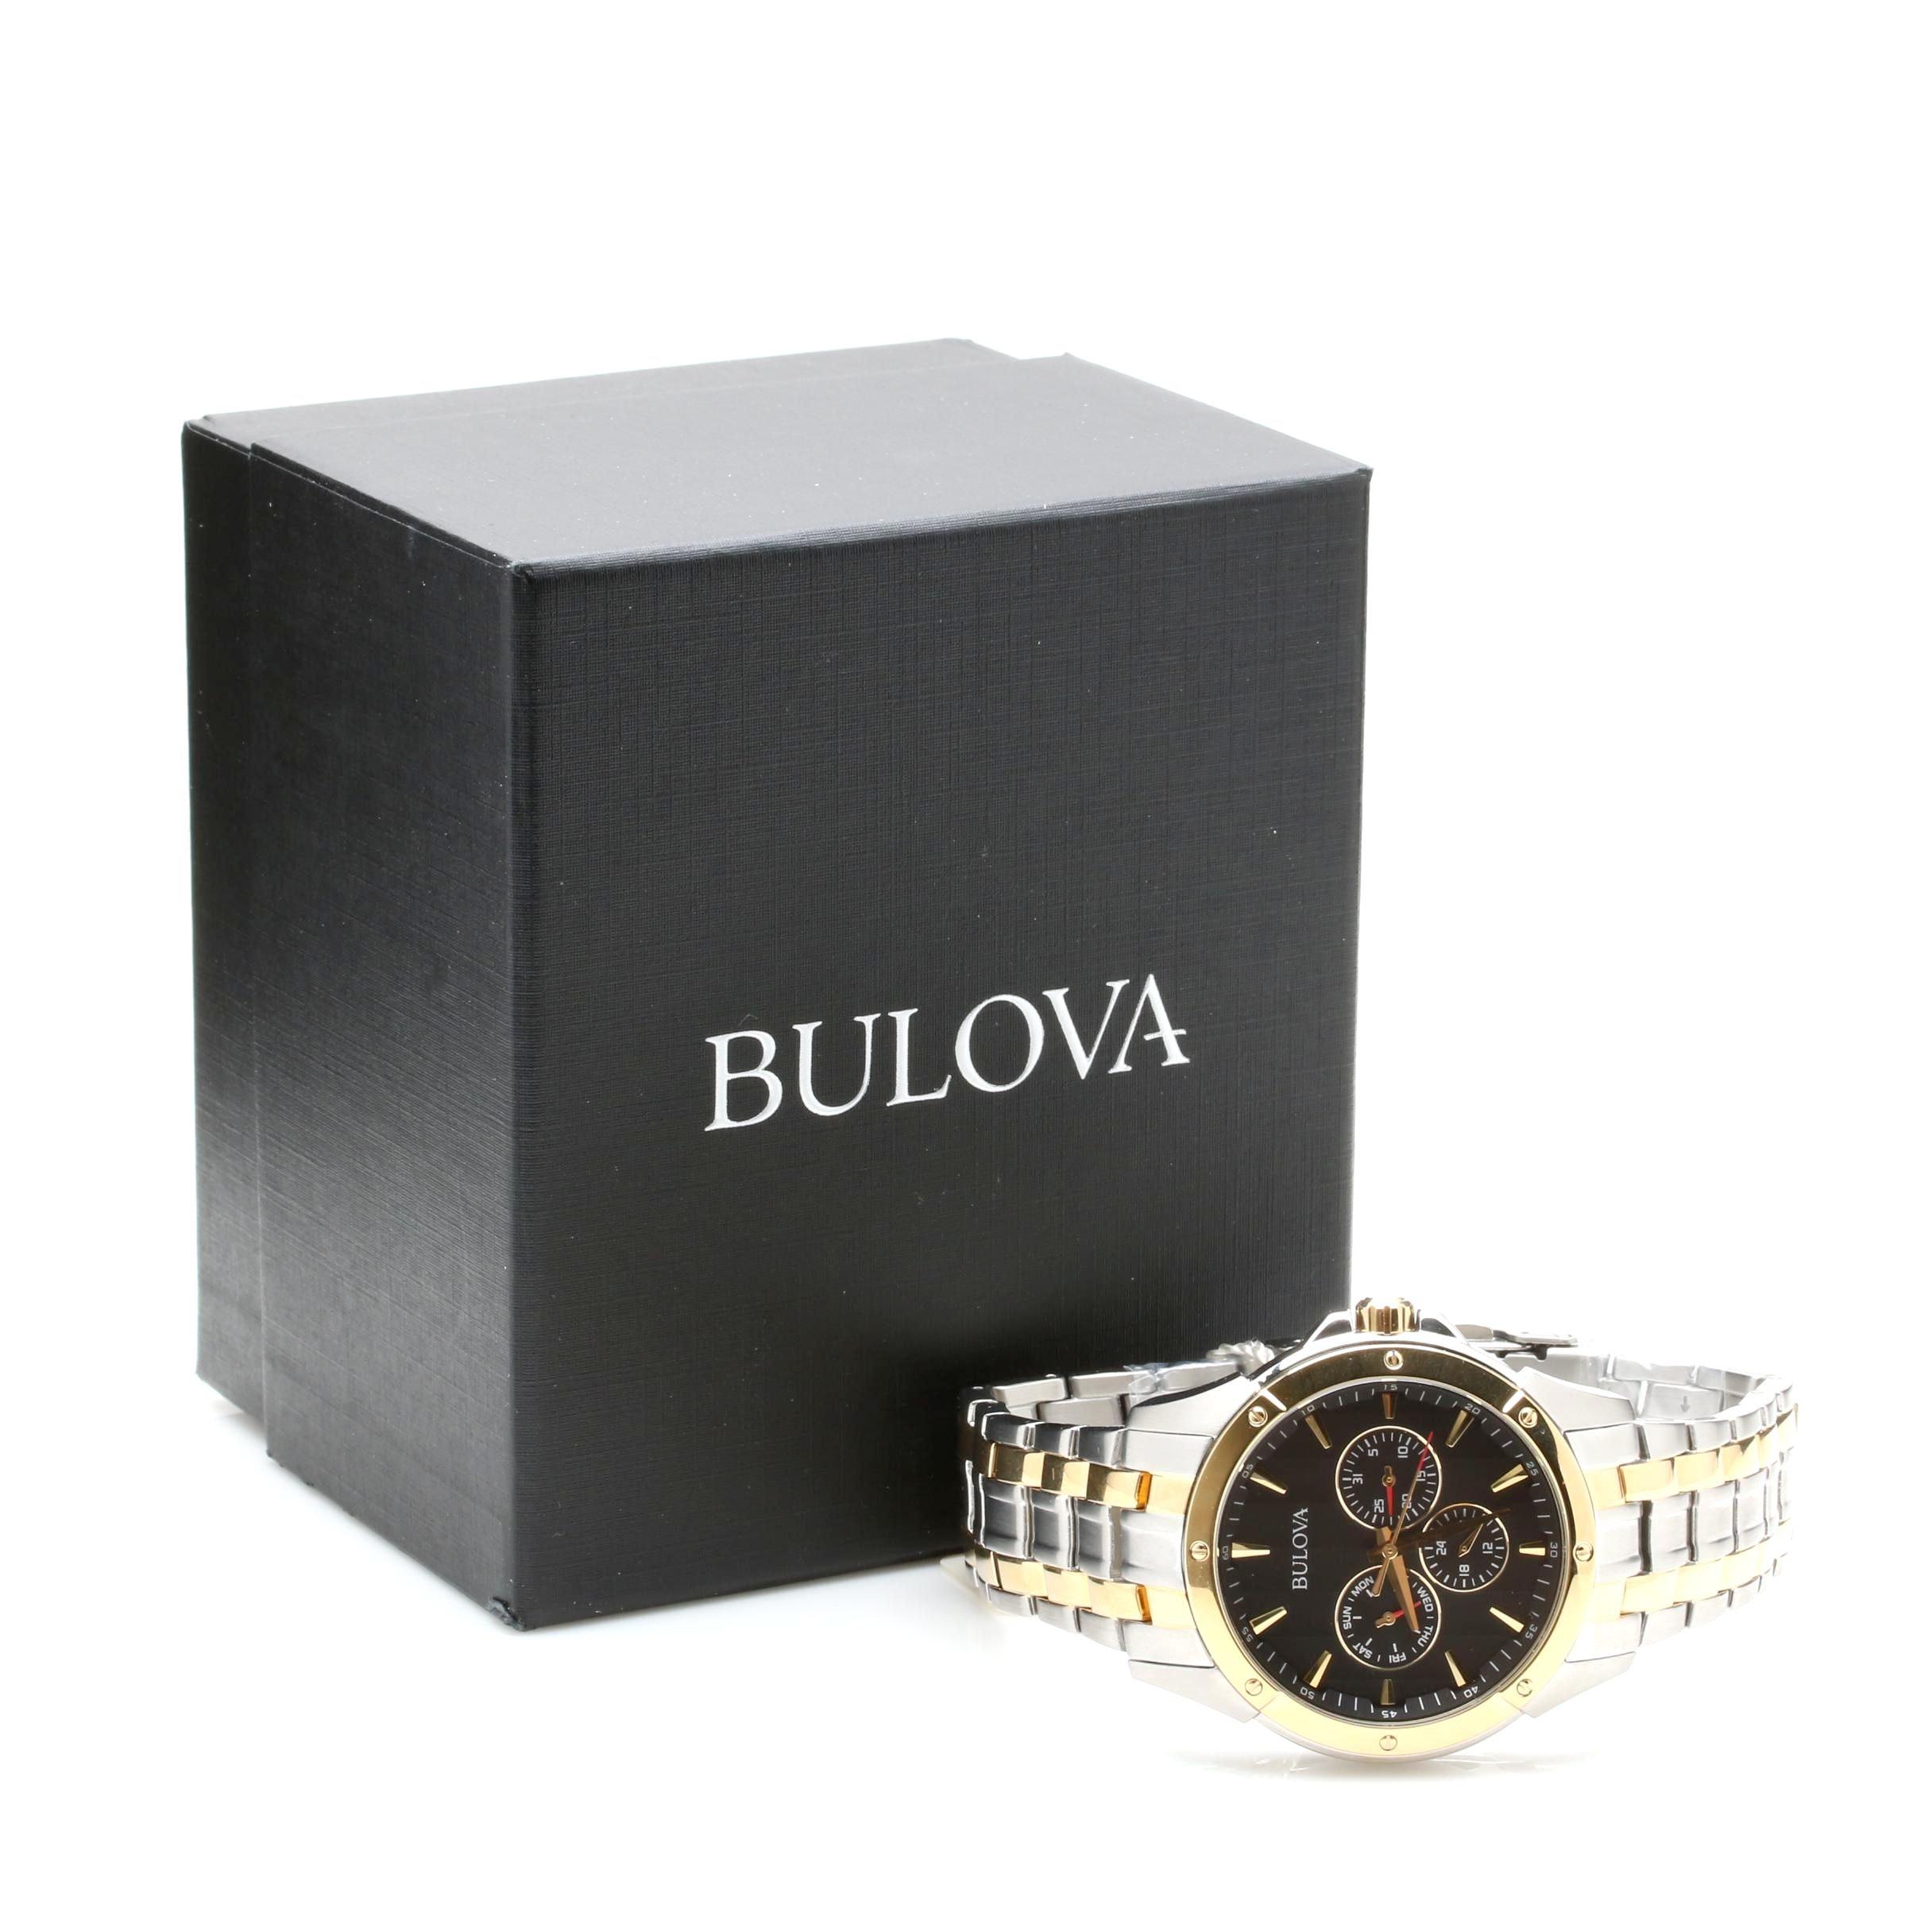 Bulova Two Tone Stainless Steel Wristwatch with Box